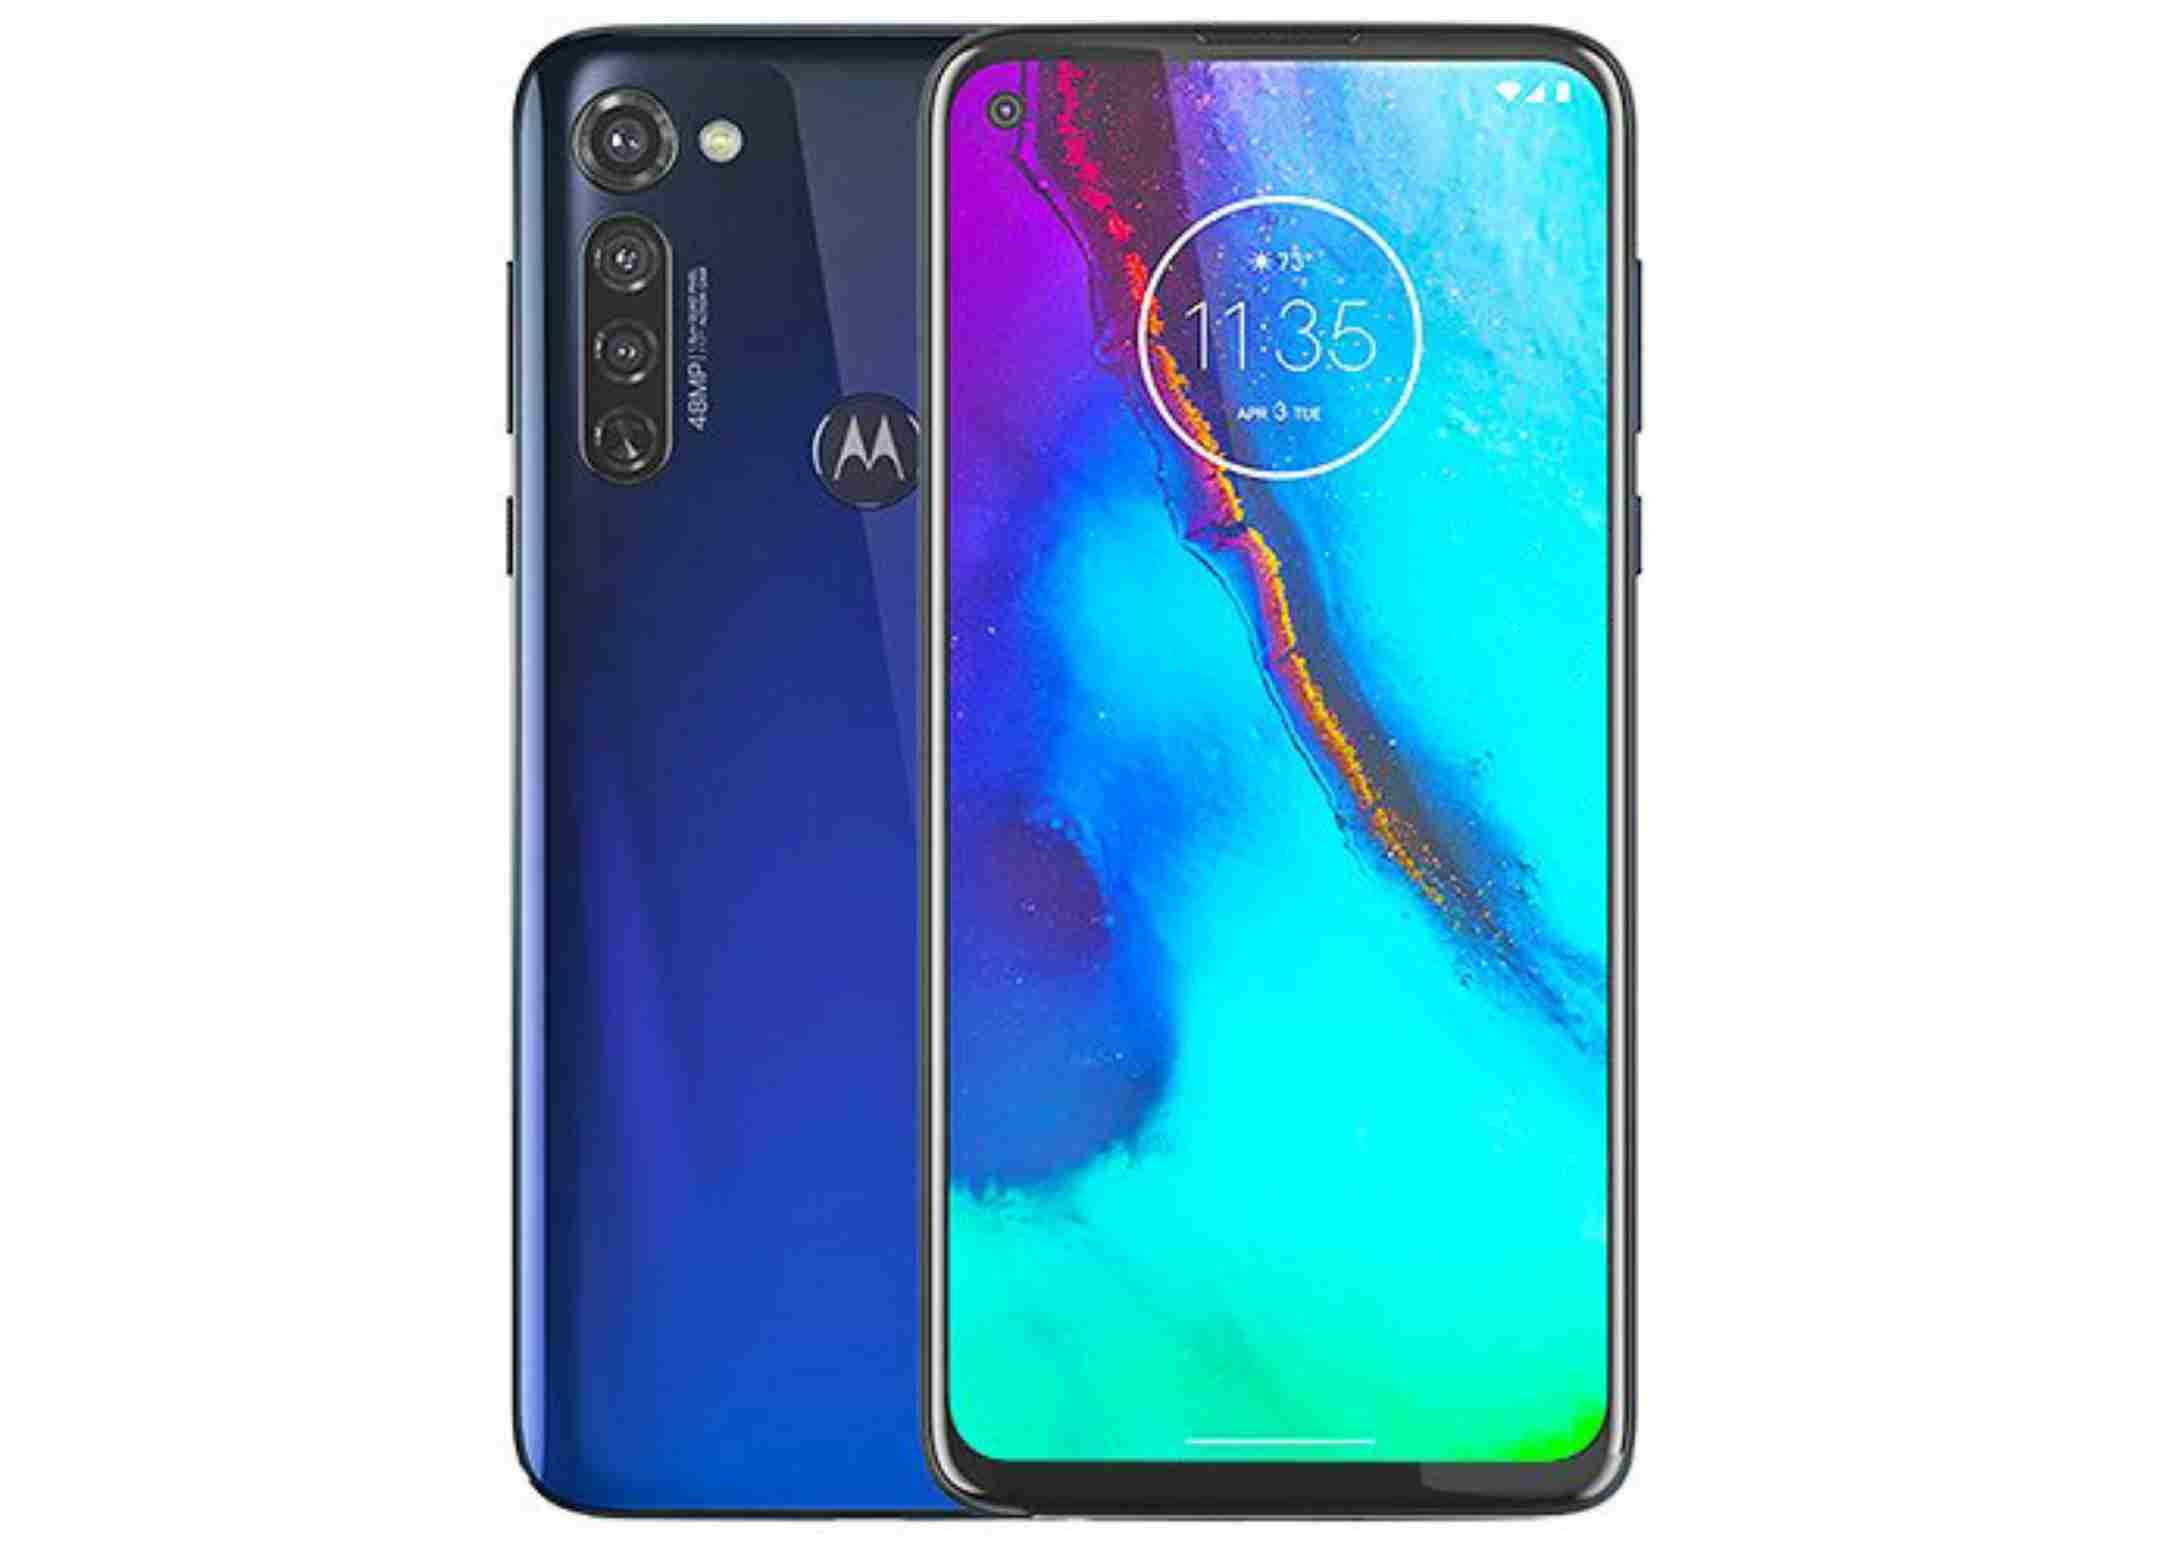 Motorola Moto E9 price, release date, specs and latest news - My Mobiles